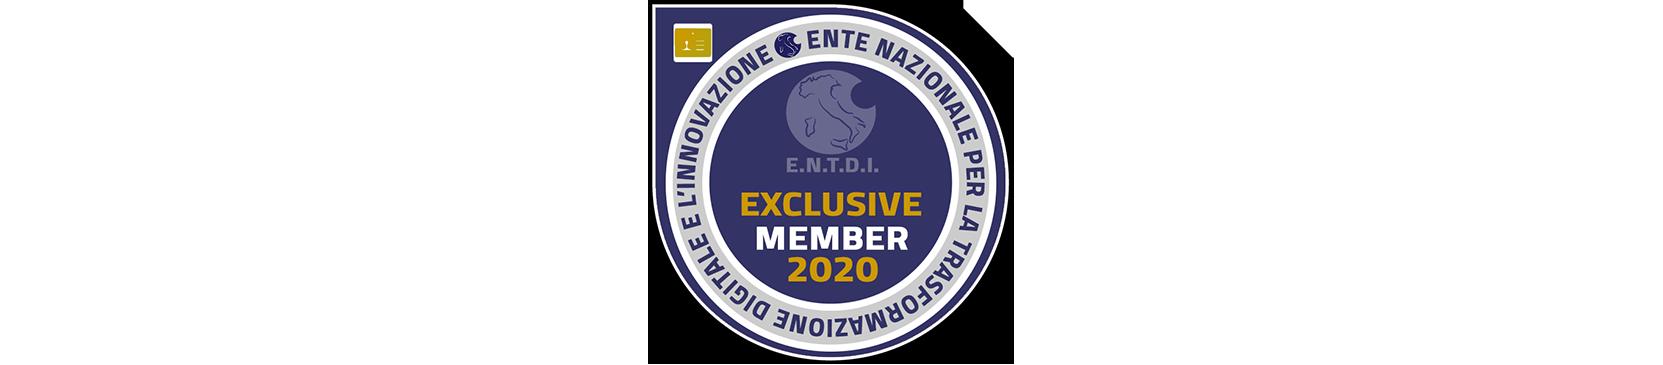 Exclusive Member ENTD